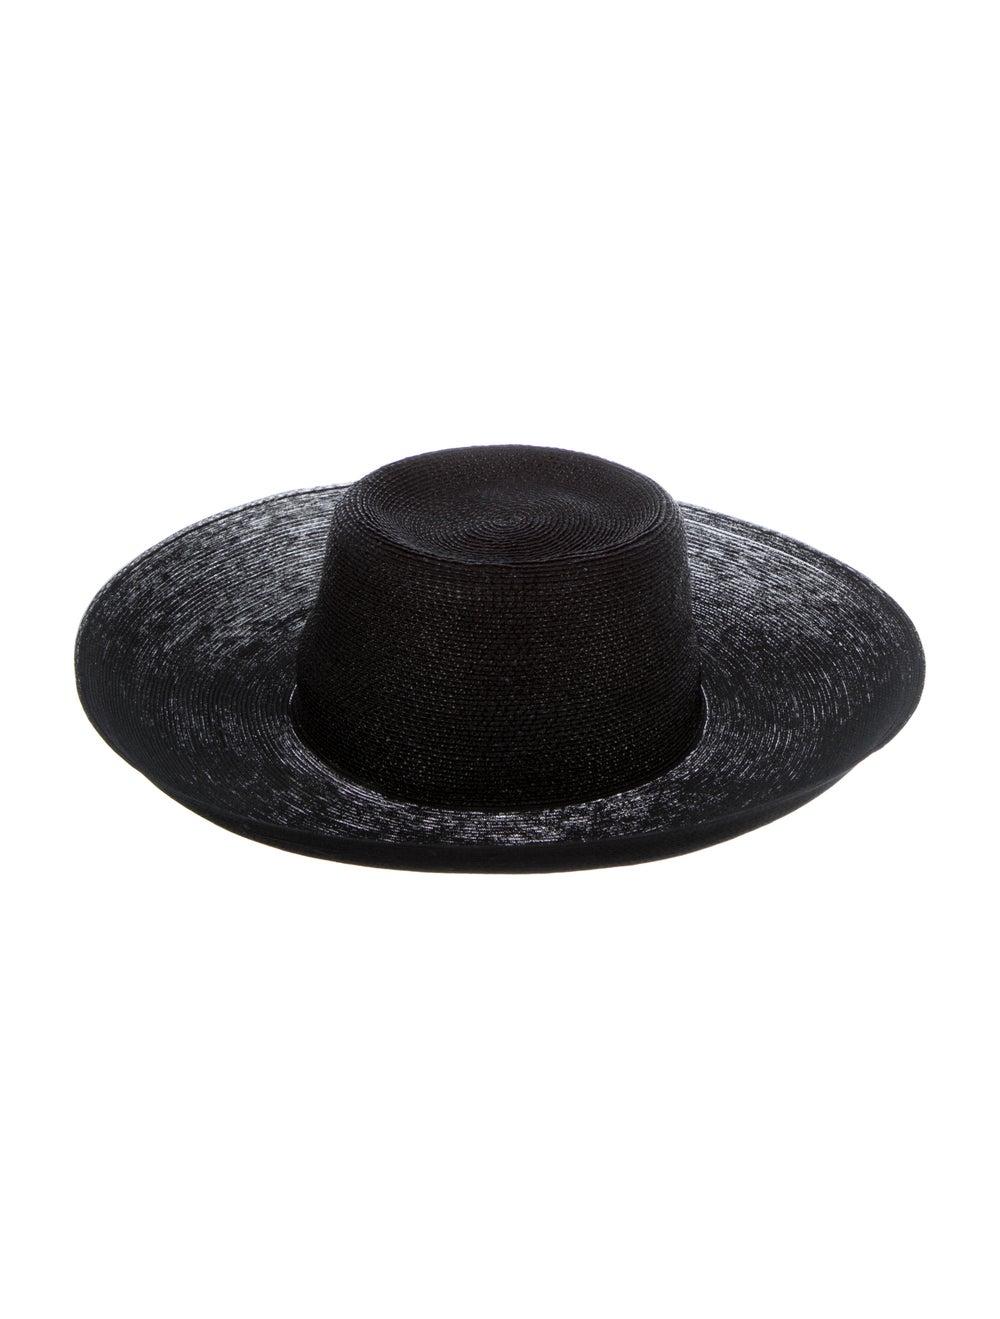 Patricia Underwood Wide-Brim Straw Hat Black - image 2